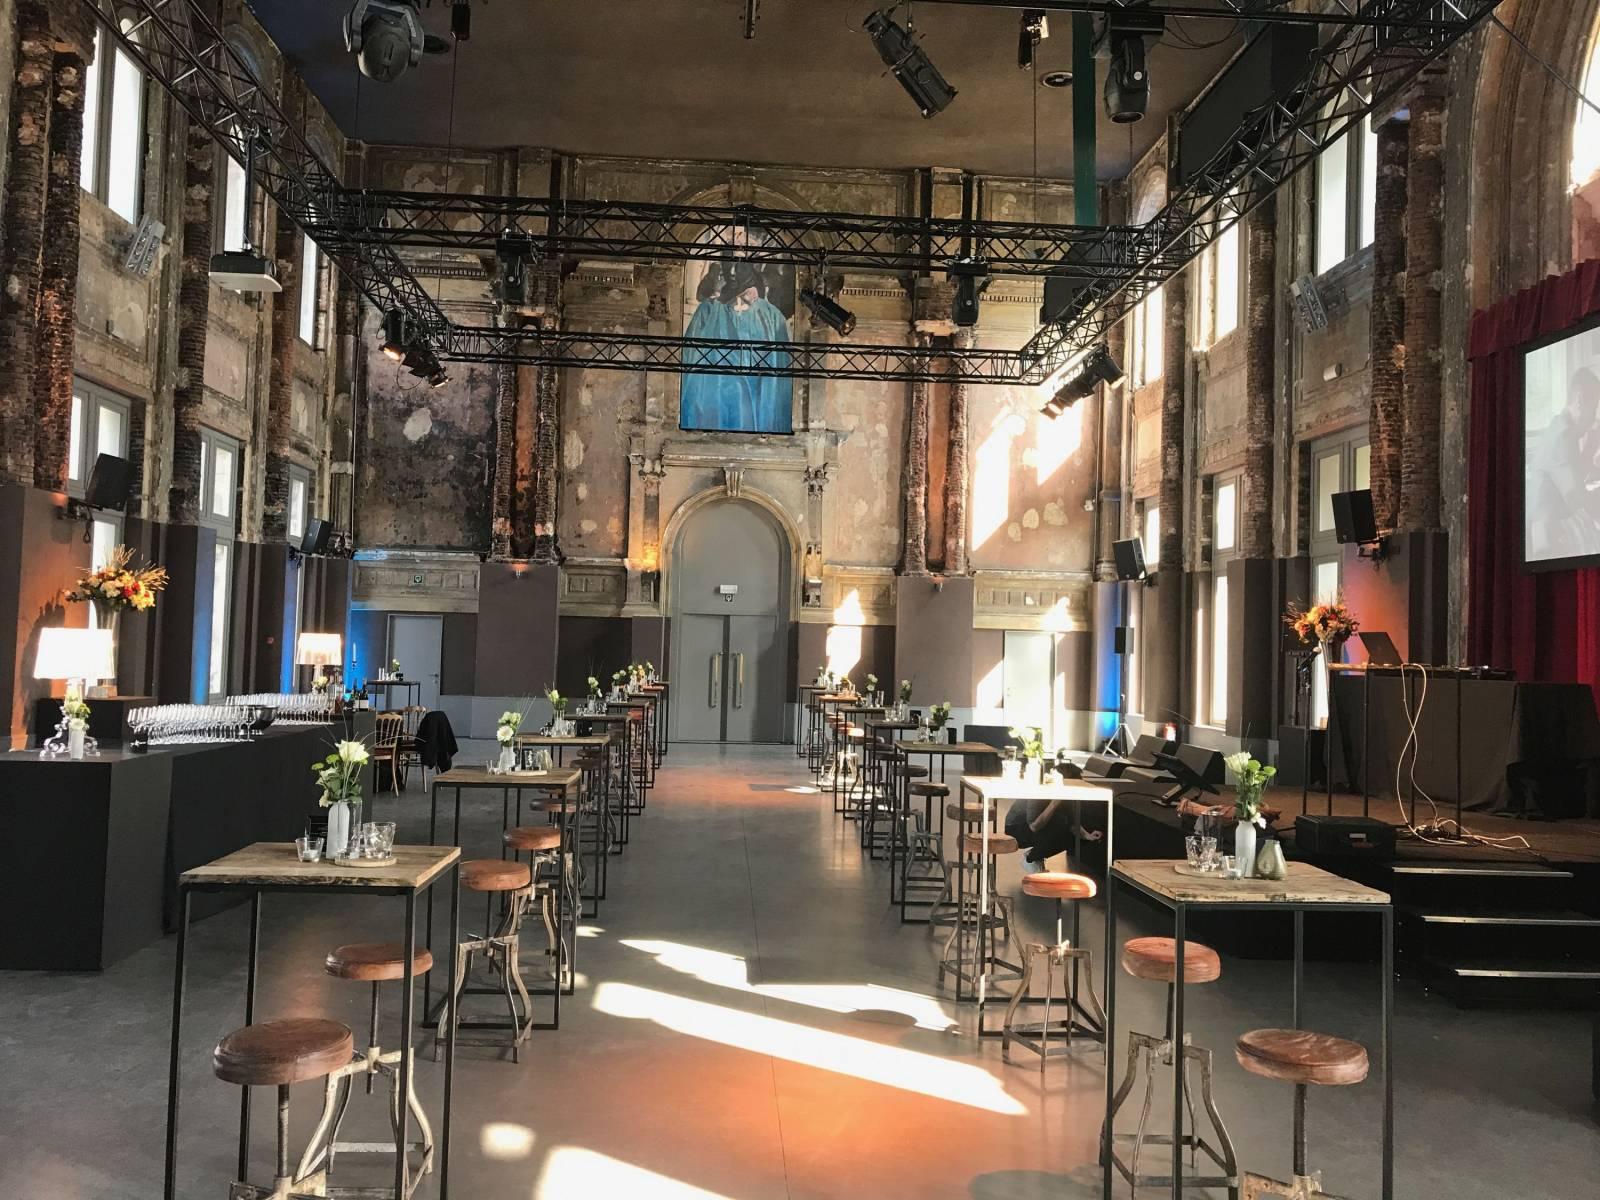 Zaal AthenA - Feestzaal - Trouwzaal - Antwerpen - House of Weddings - 25